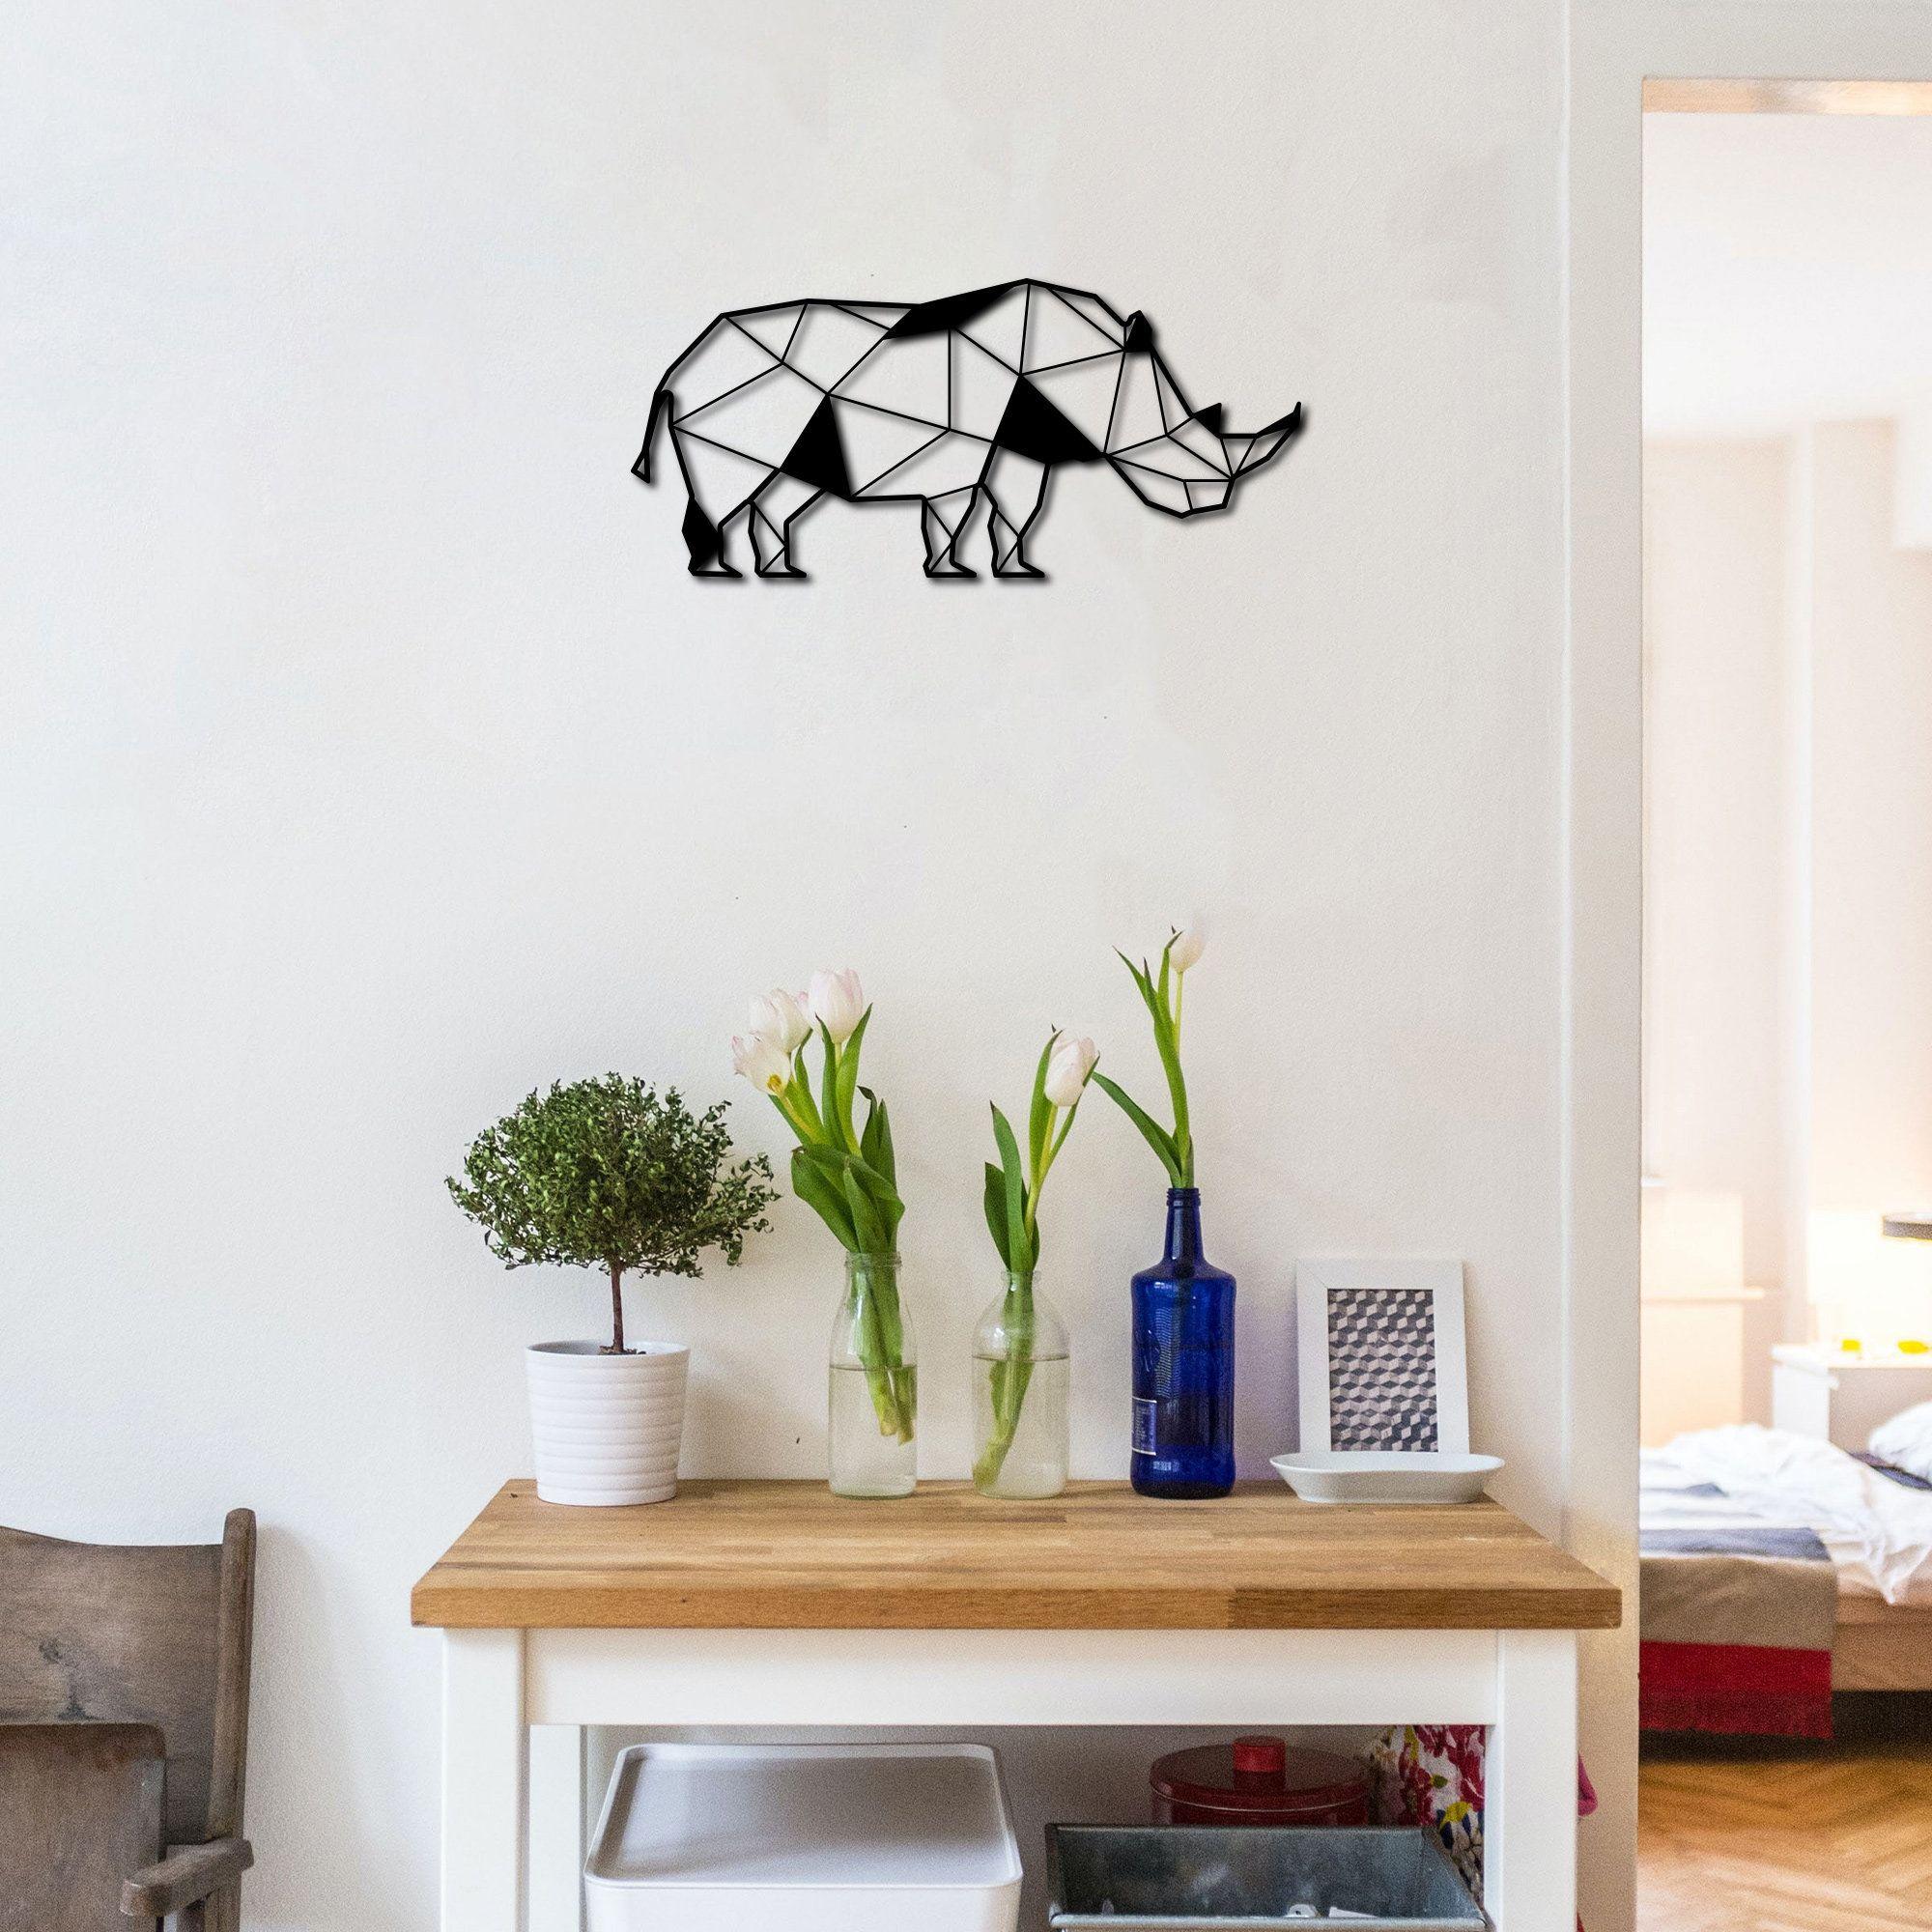 Metal Wall Art Rhino Interior Decoration Home Decor Wall Etsy Metal Wall Art Owl Wall Decor Wall Art Decor